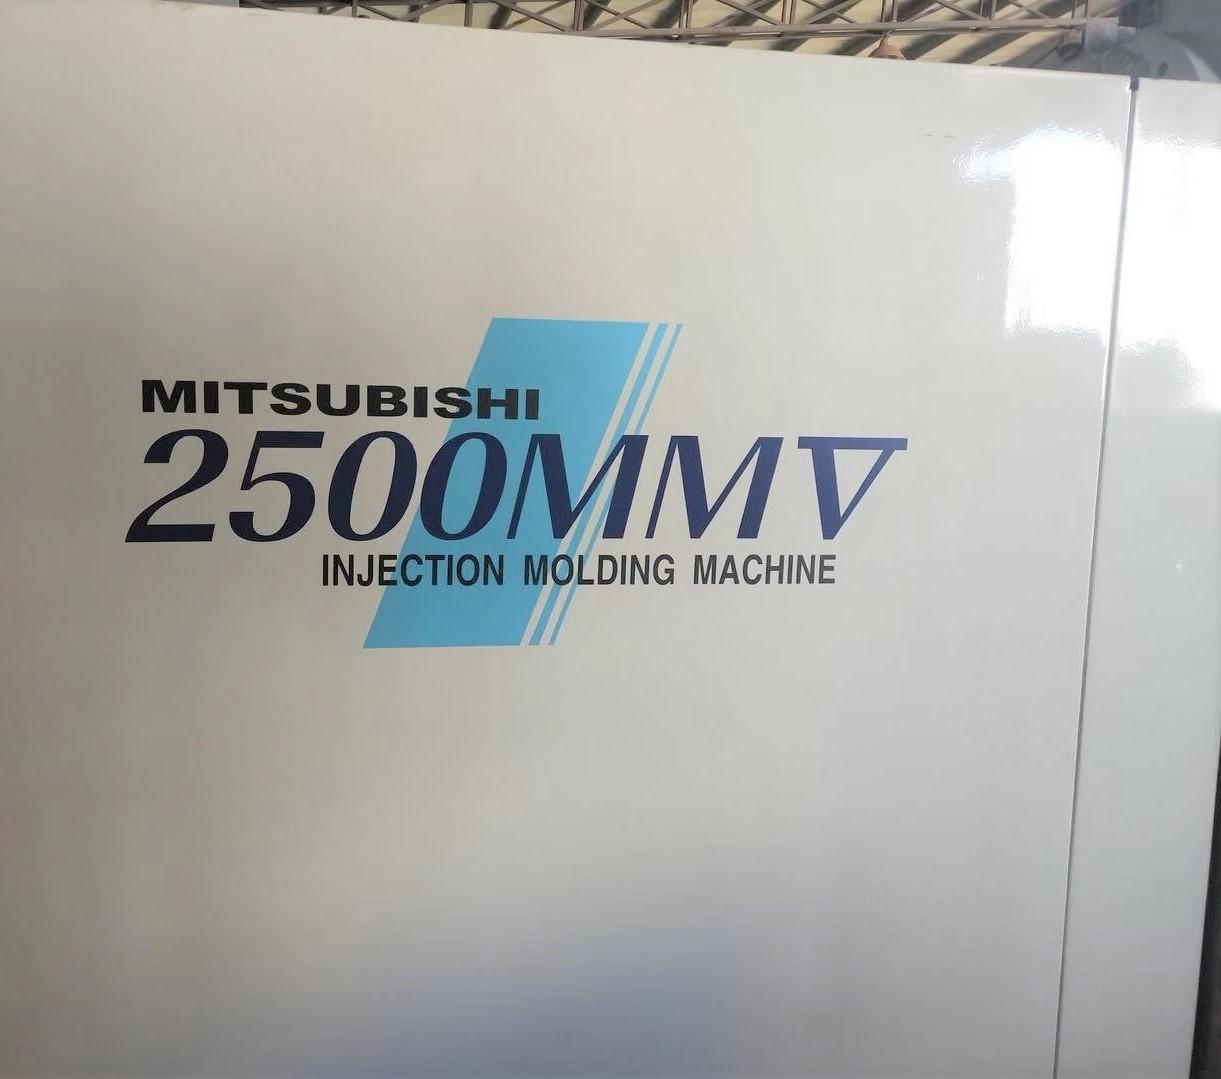 Mitsubishi 2500t used Plastic Injection Molding Machine